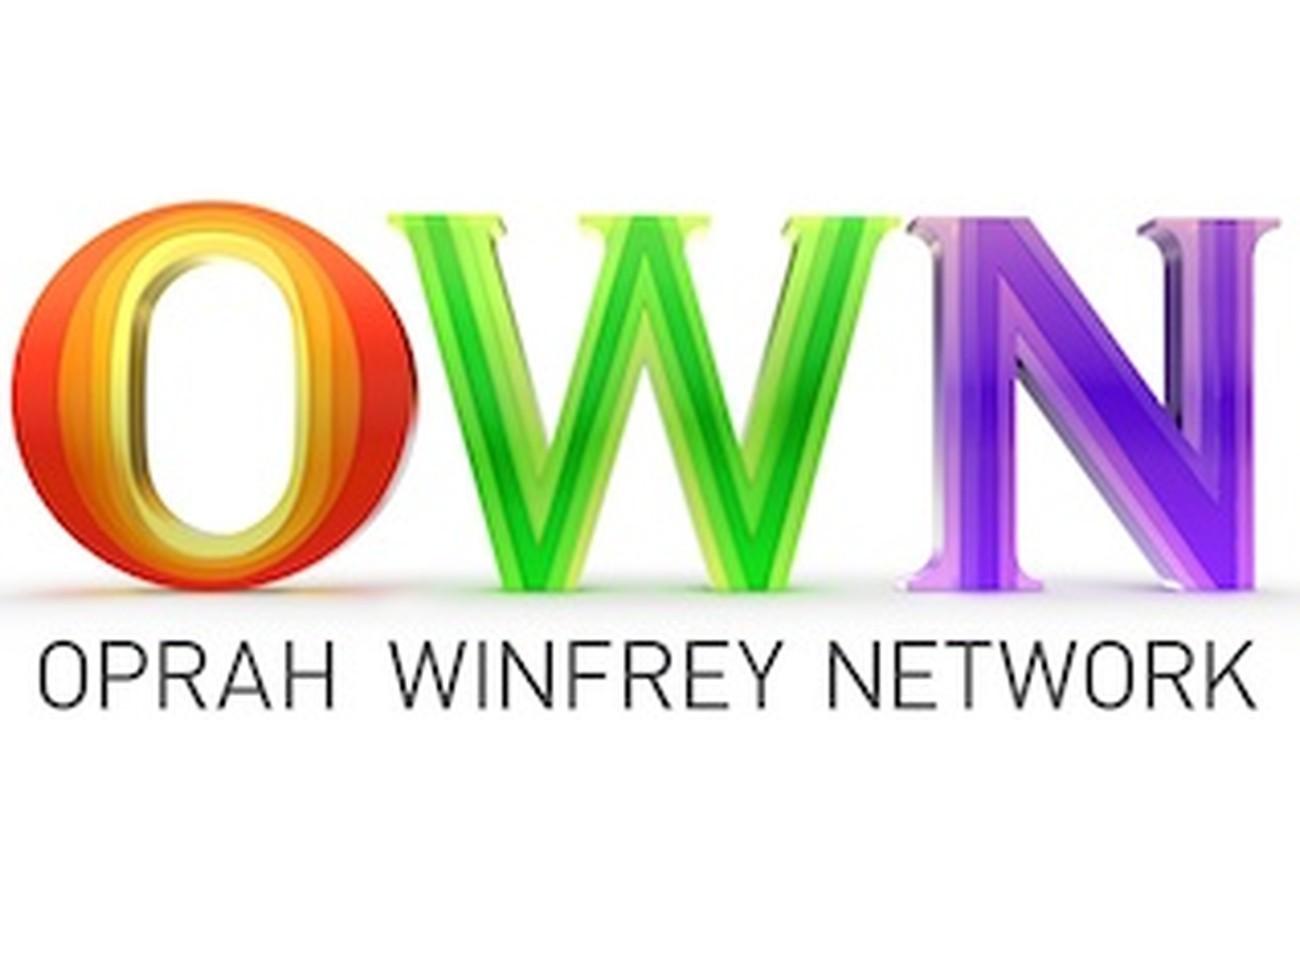 Oprah Winfrey Network Careers